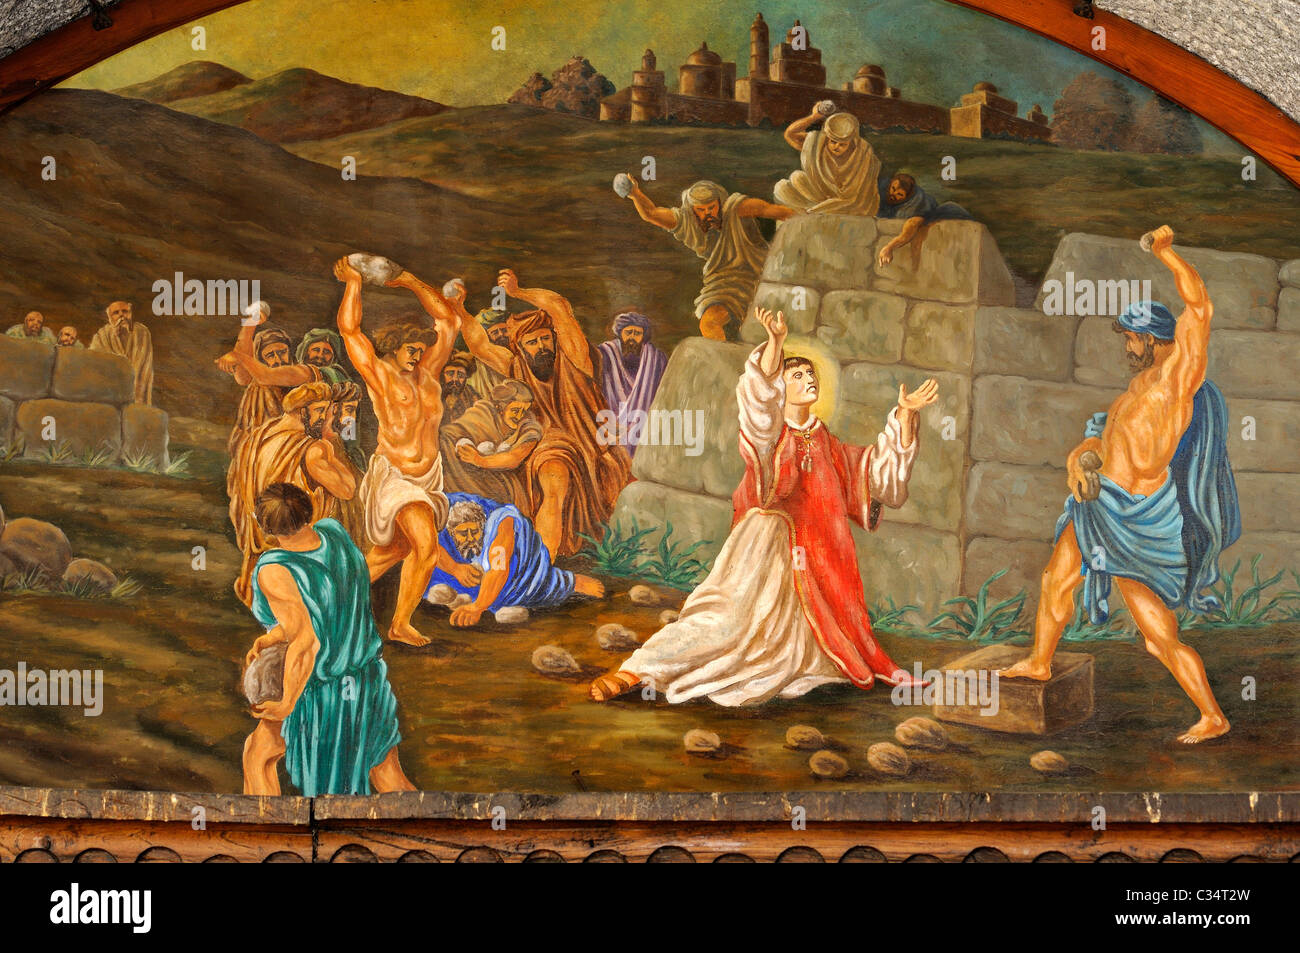 Religious painting The attempted stoning of Christ, Church Sant Esteve, Barri Antic, Andorra La Vella, Principality - Stock Image